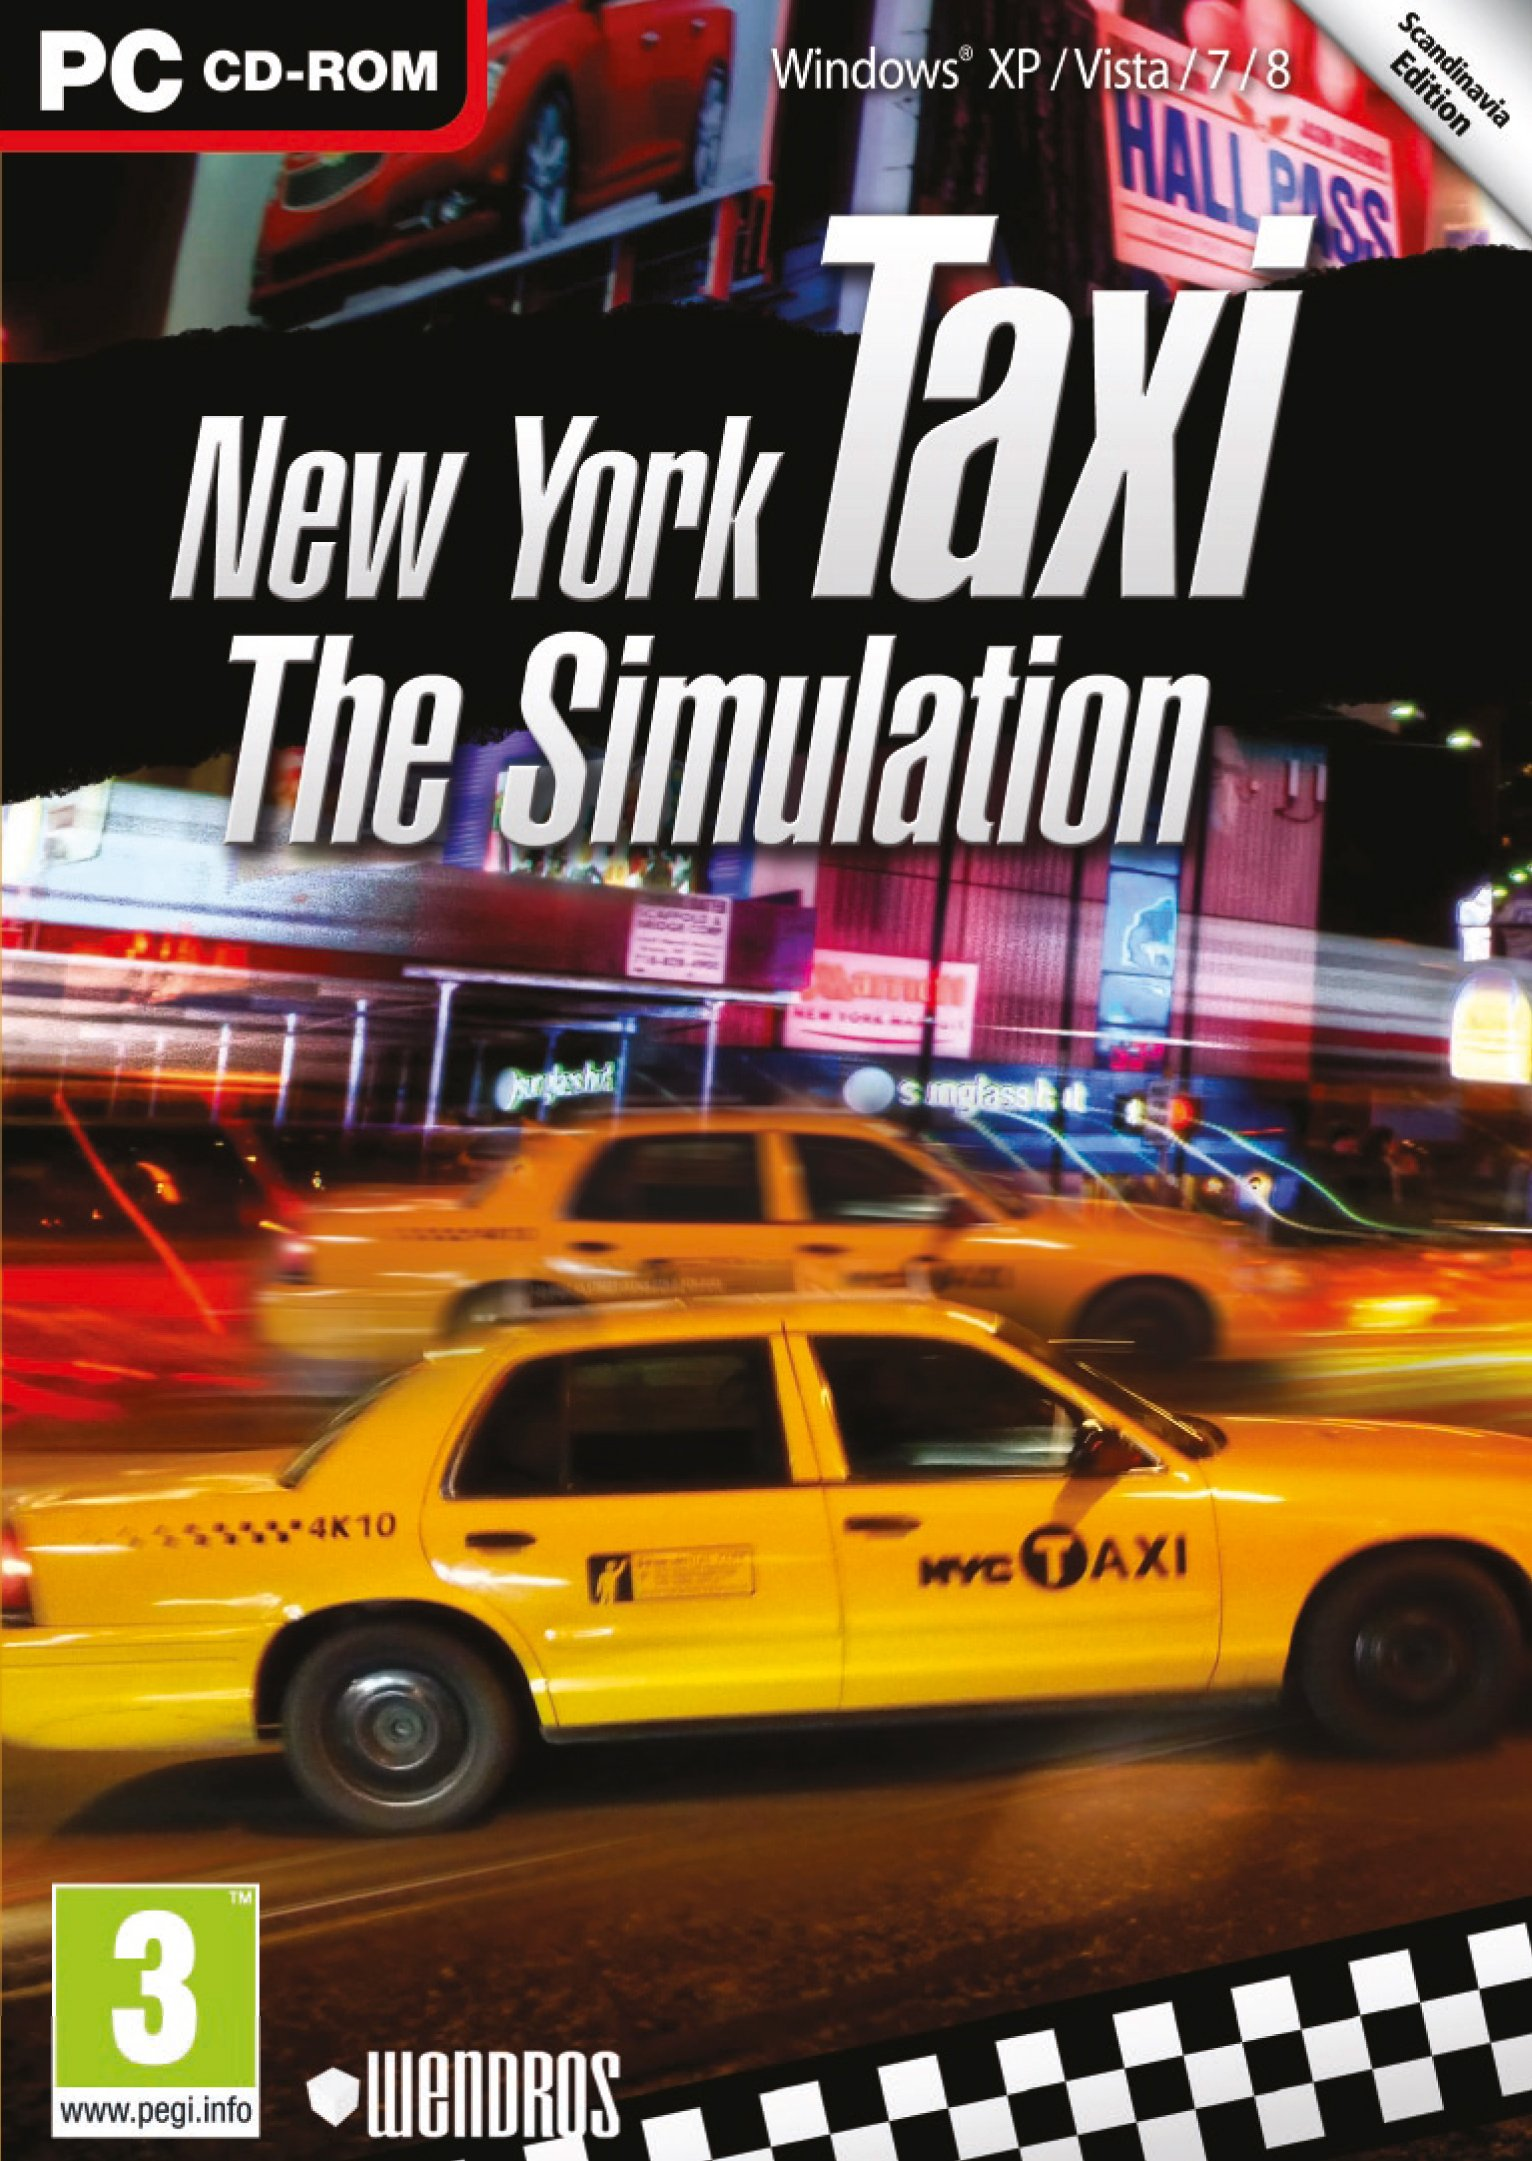 New York Taxi - The Simulator